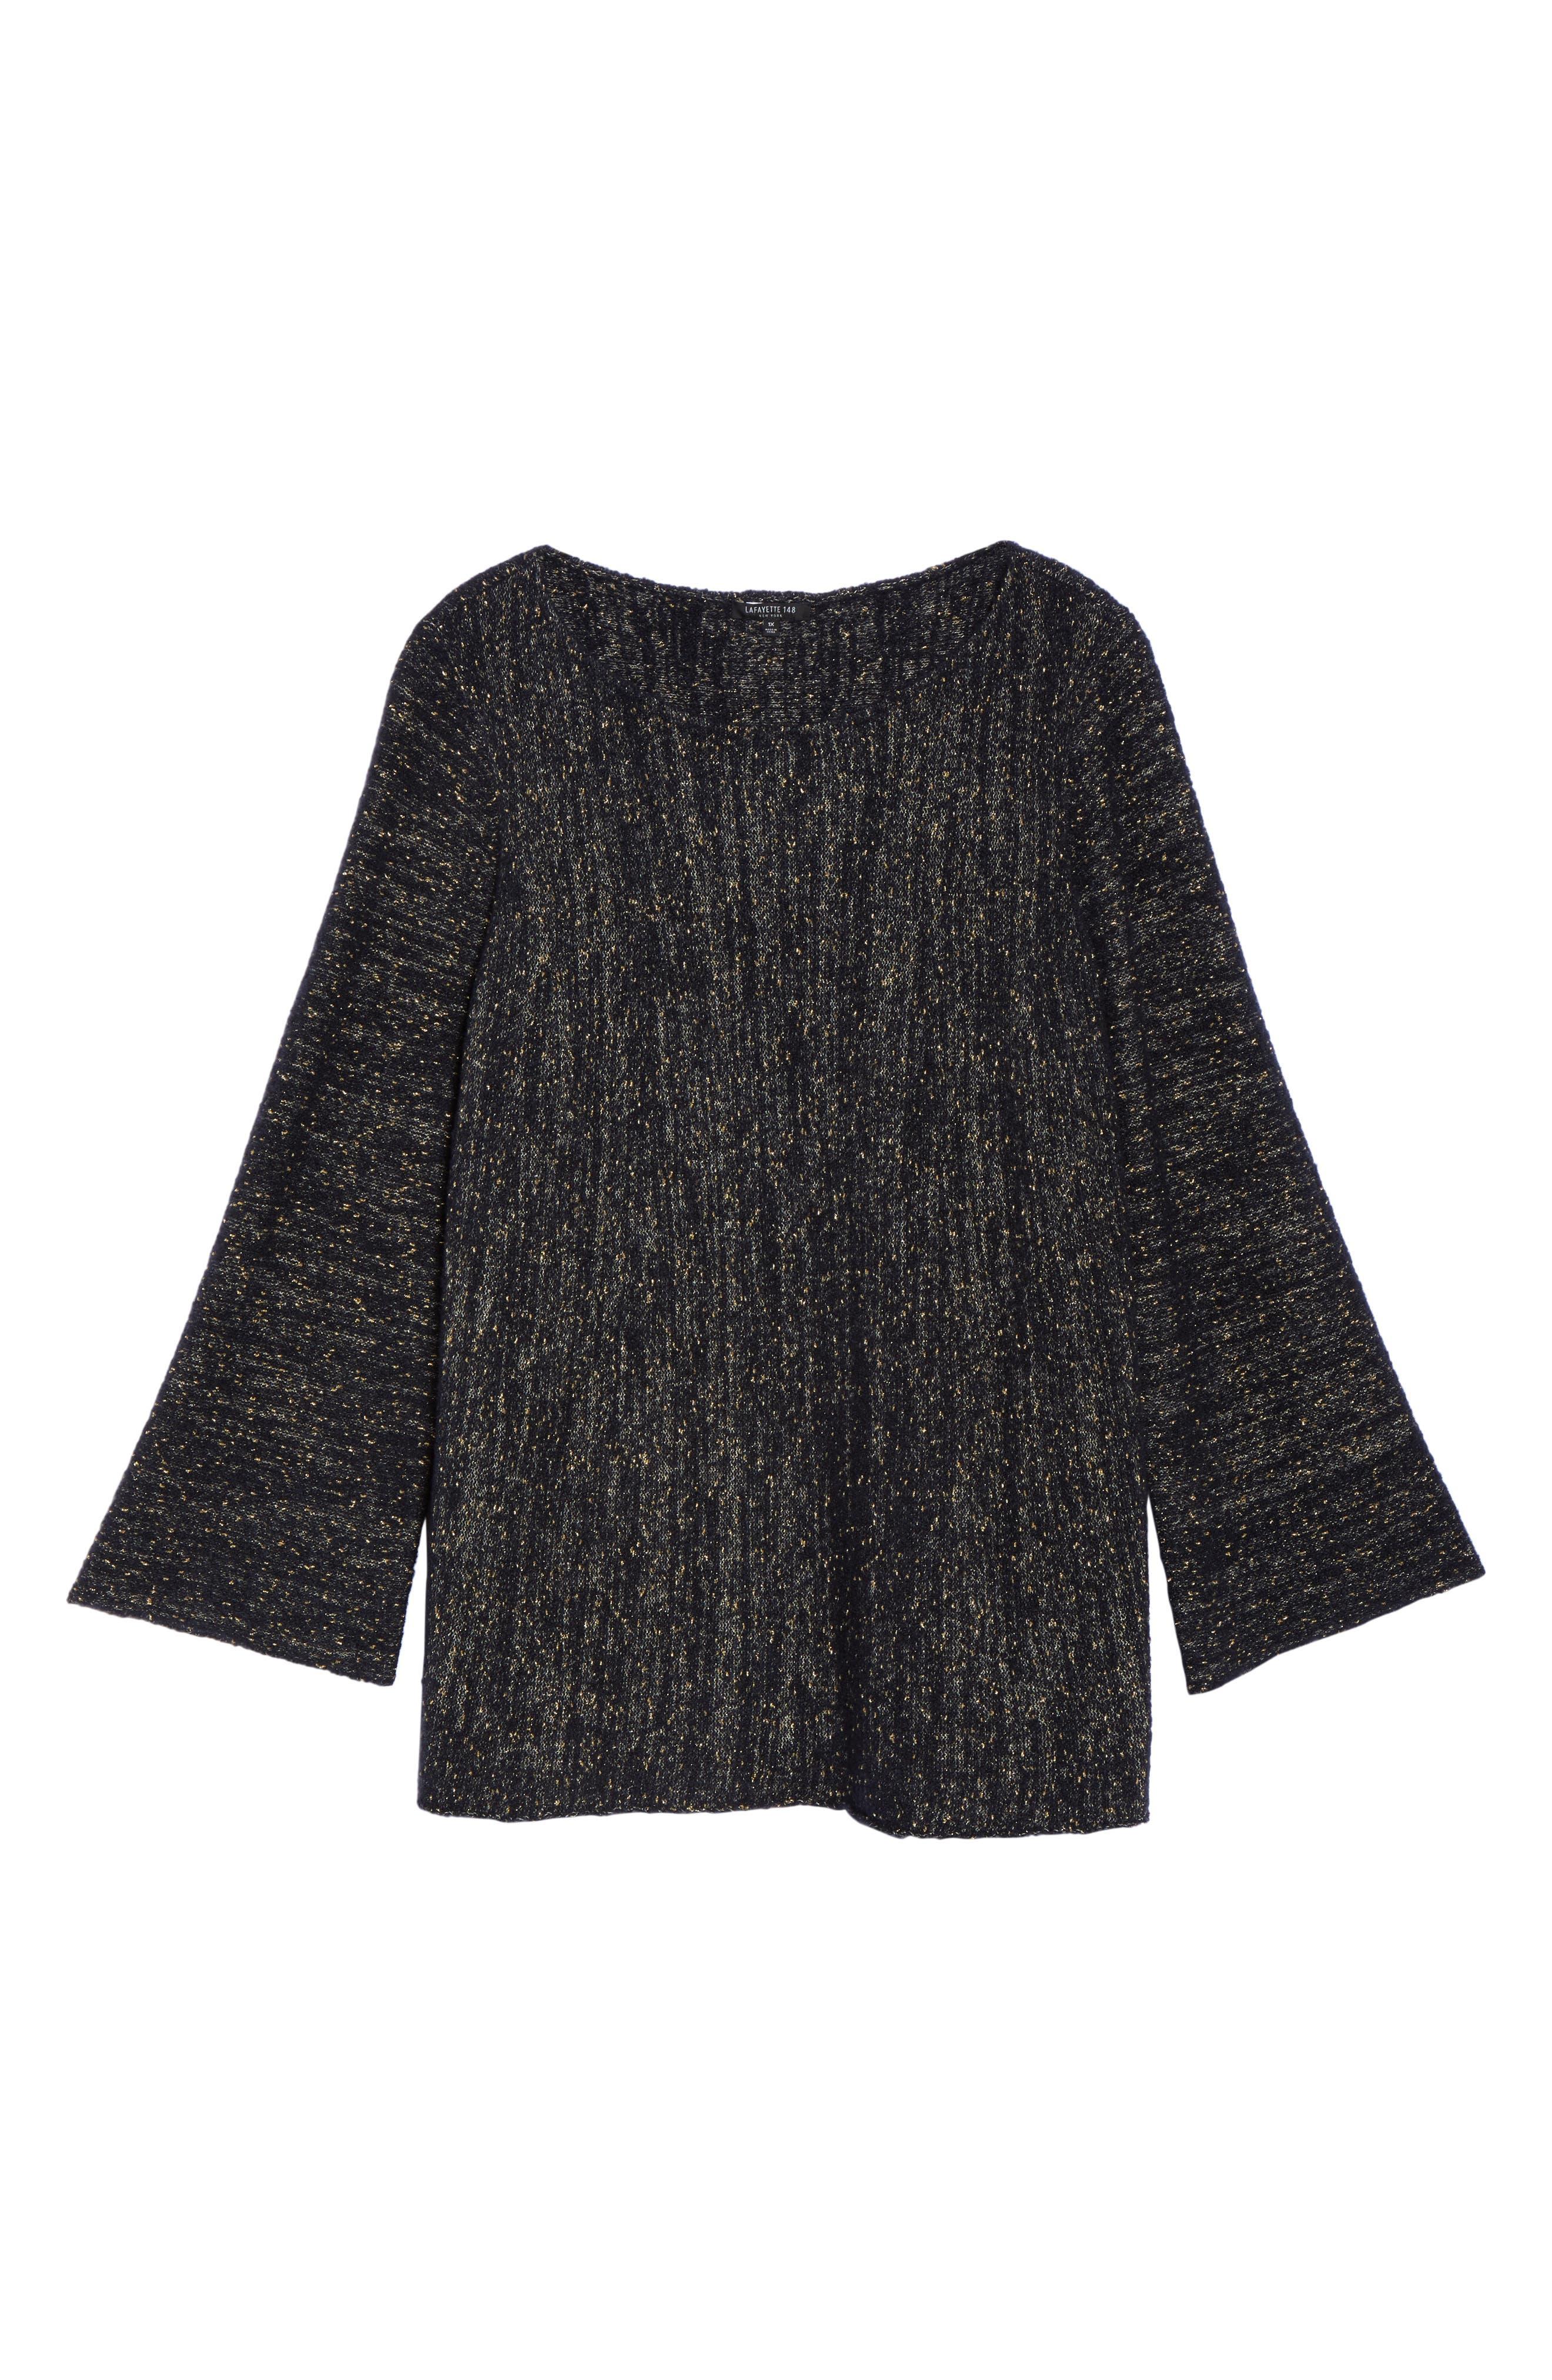 Lafayette 148 Metallic Knit A-Line Sweater,                             Alternate thumbnail 6, color,                             479